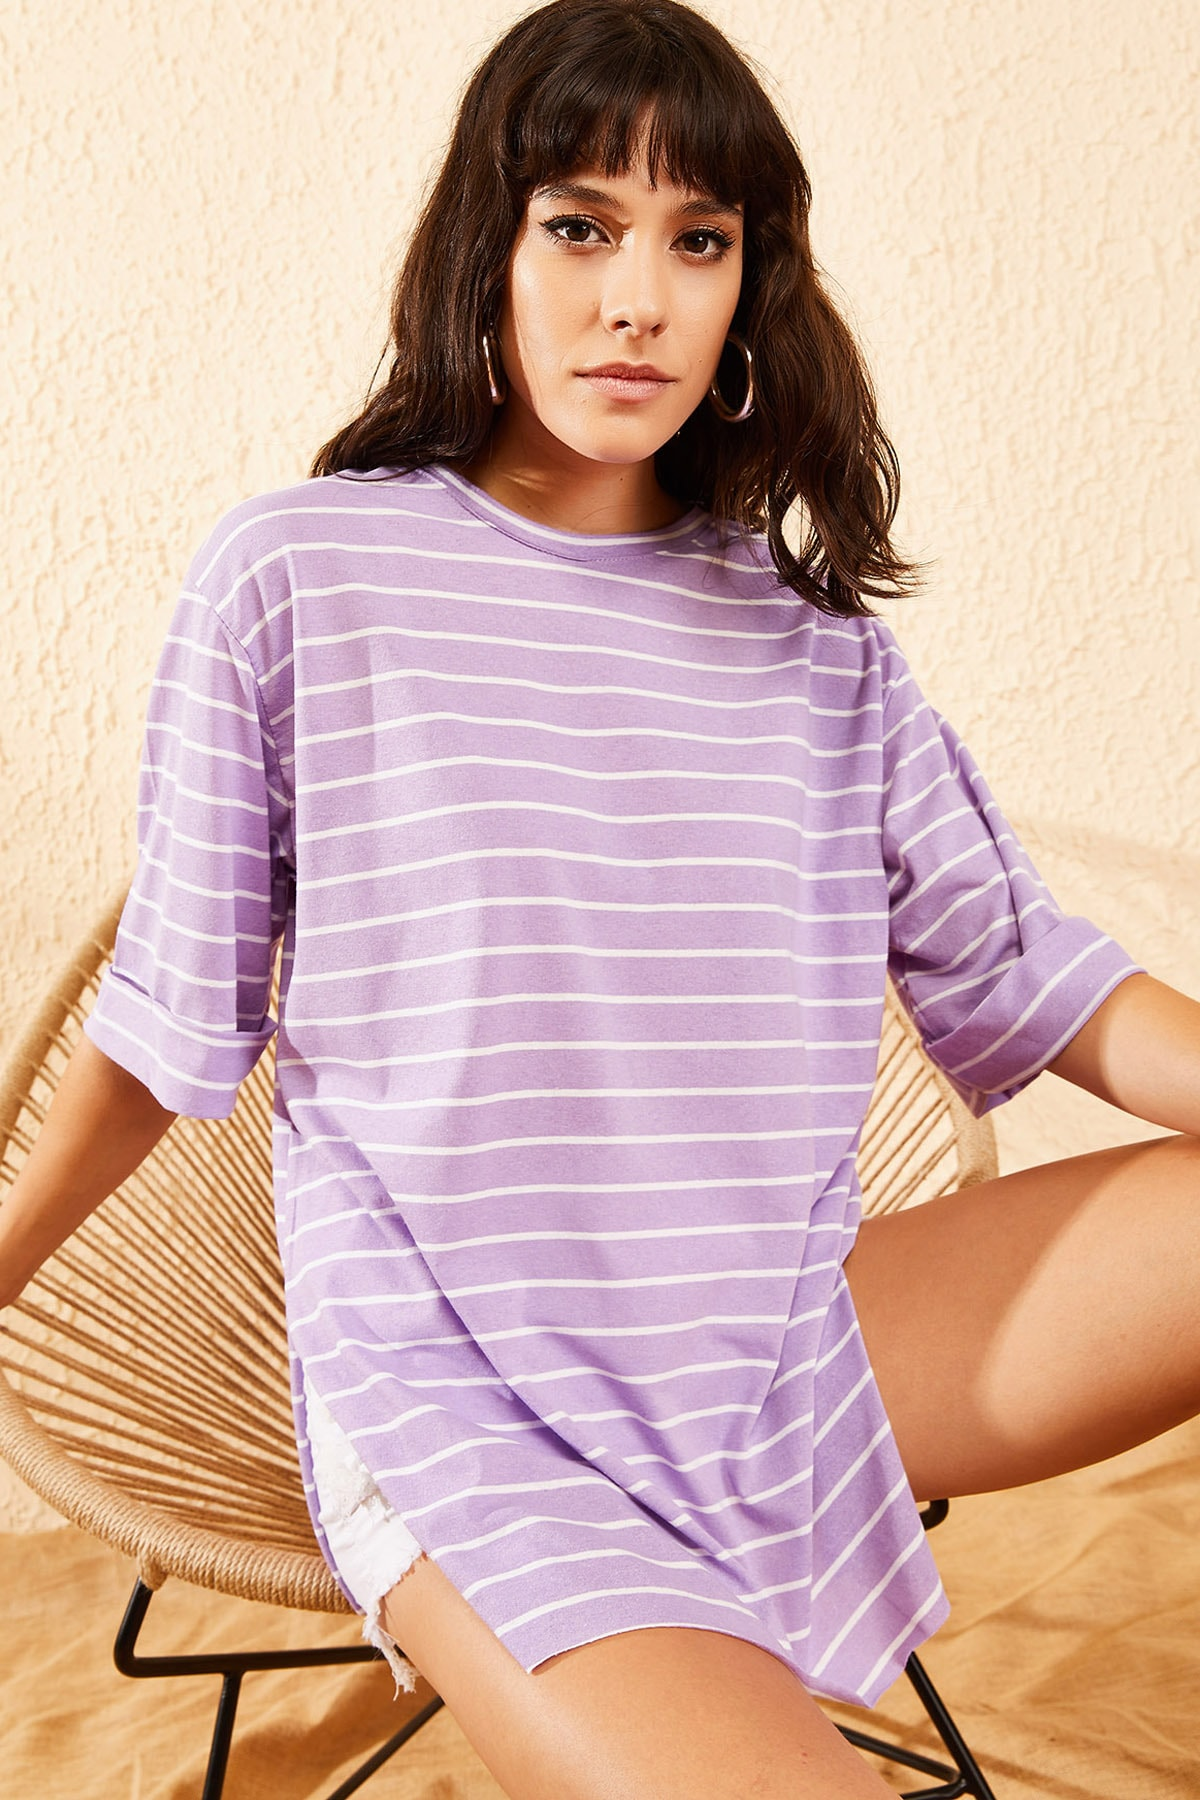 Bianco Lucci Kadın Lila Beyaz Çizgili Kol Katlamalı Yan Yırtmaçlı T-Shirt 10081013